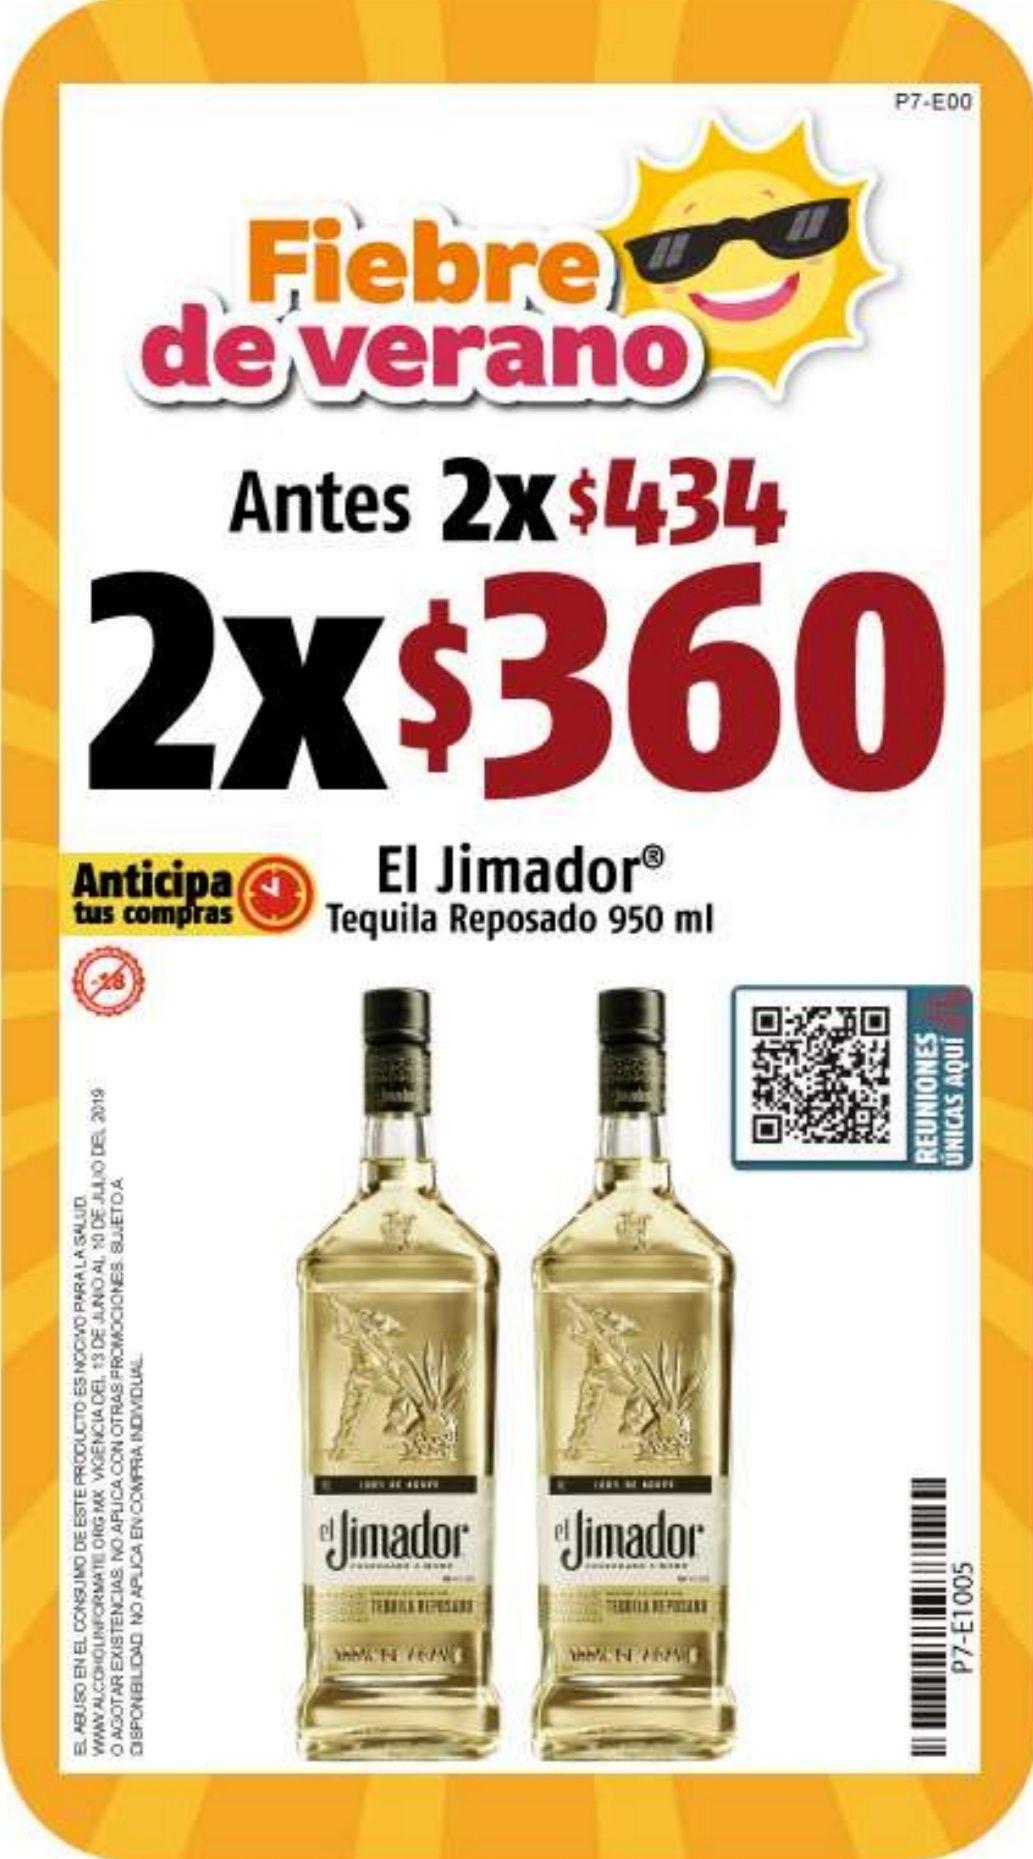 "OXXO: 2 Tequila ""El Jimador"" x $360"